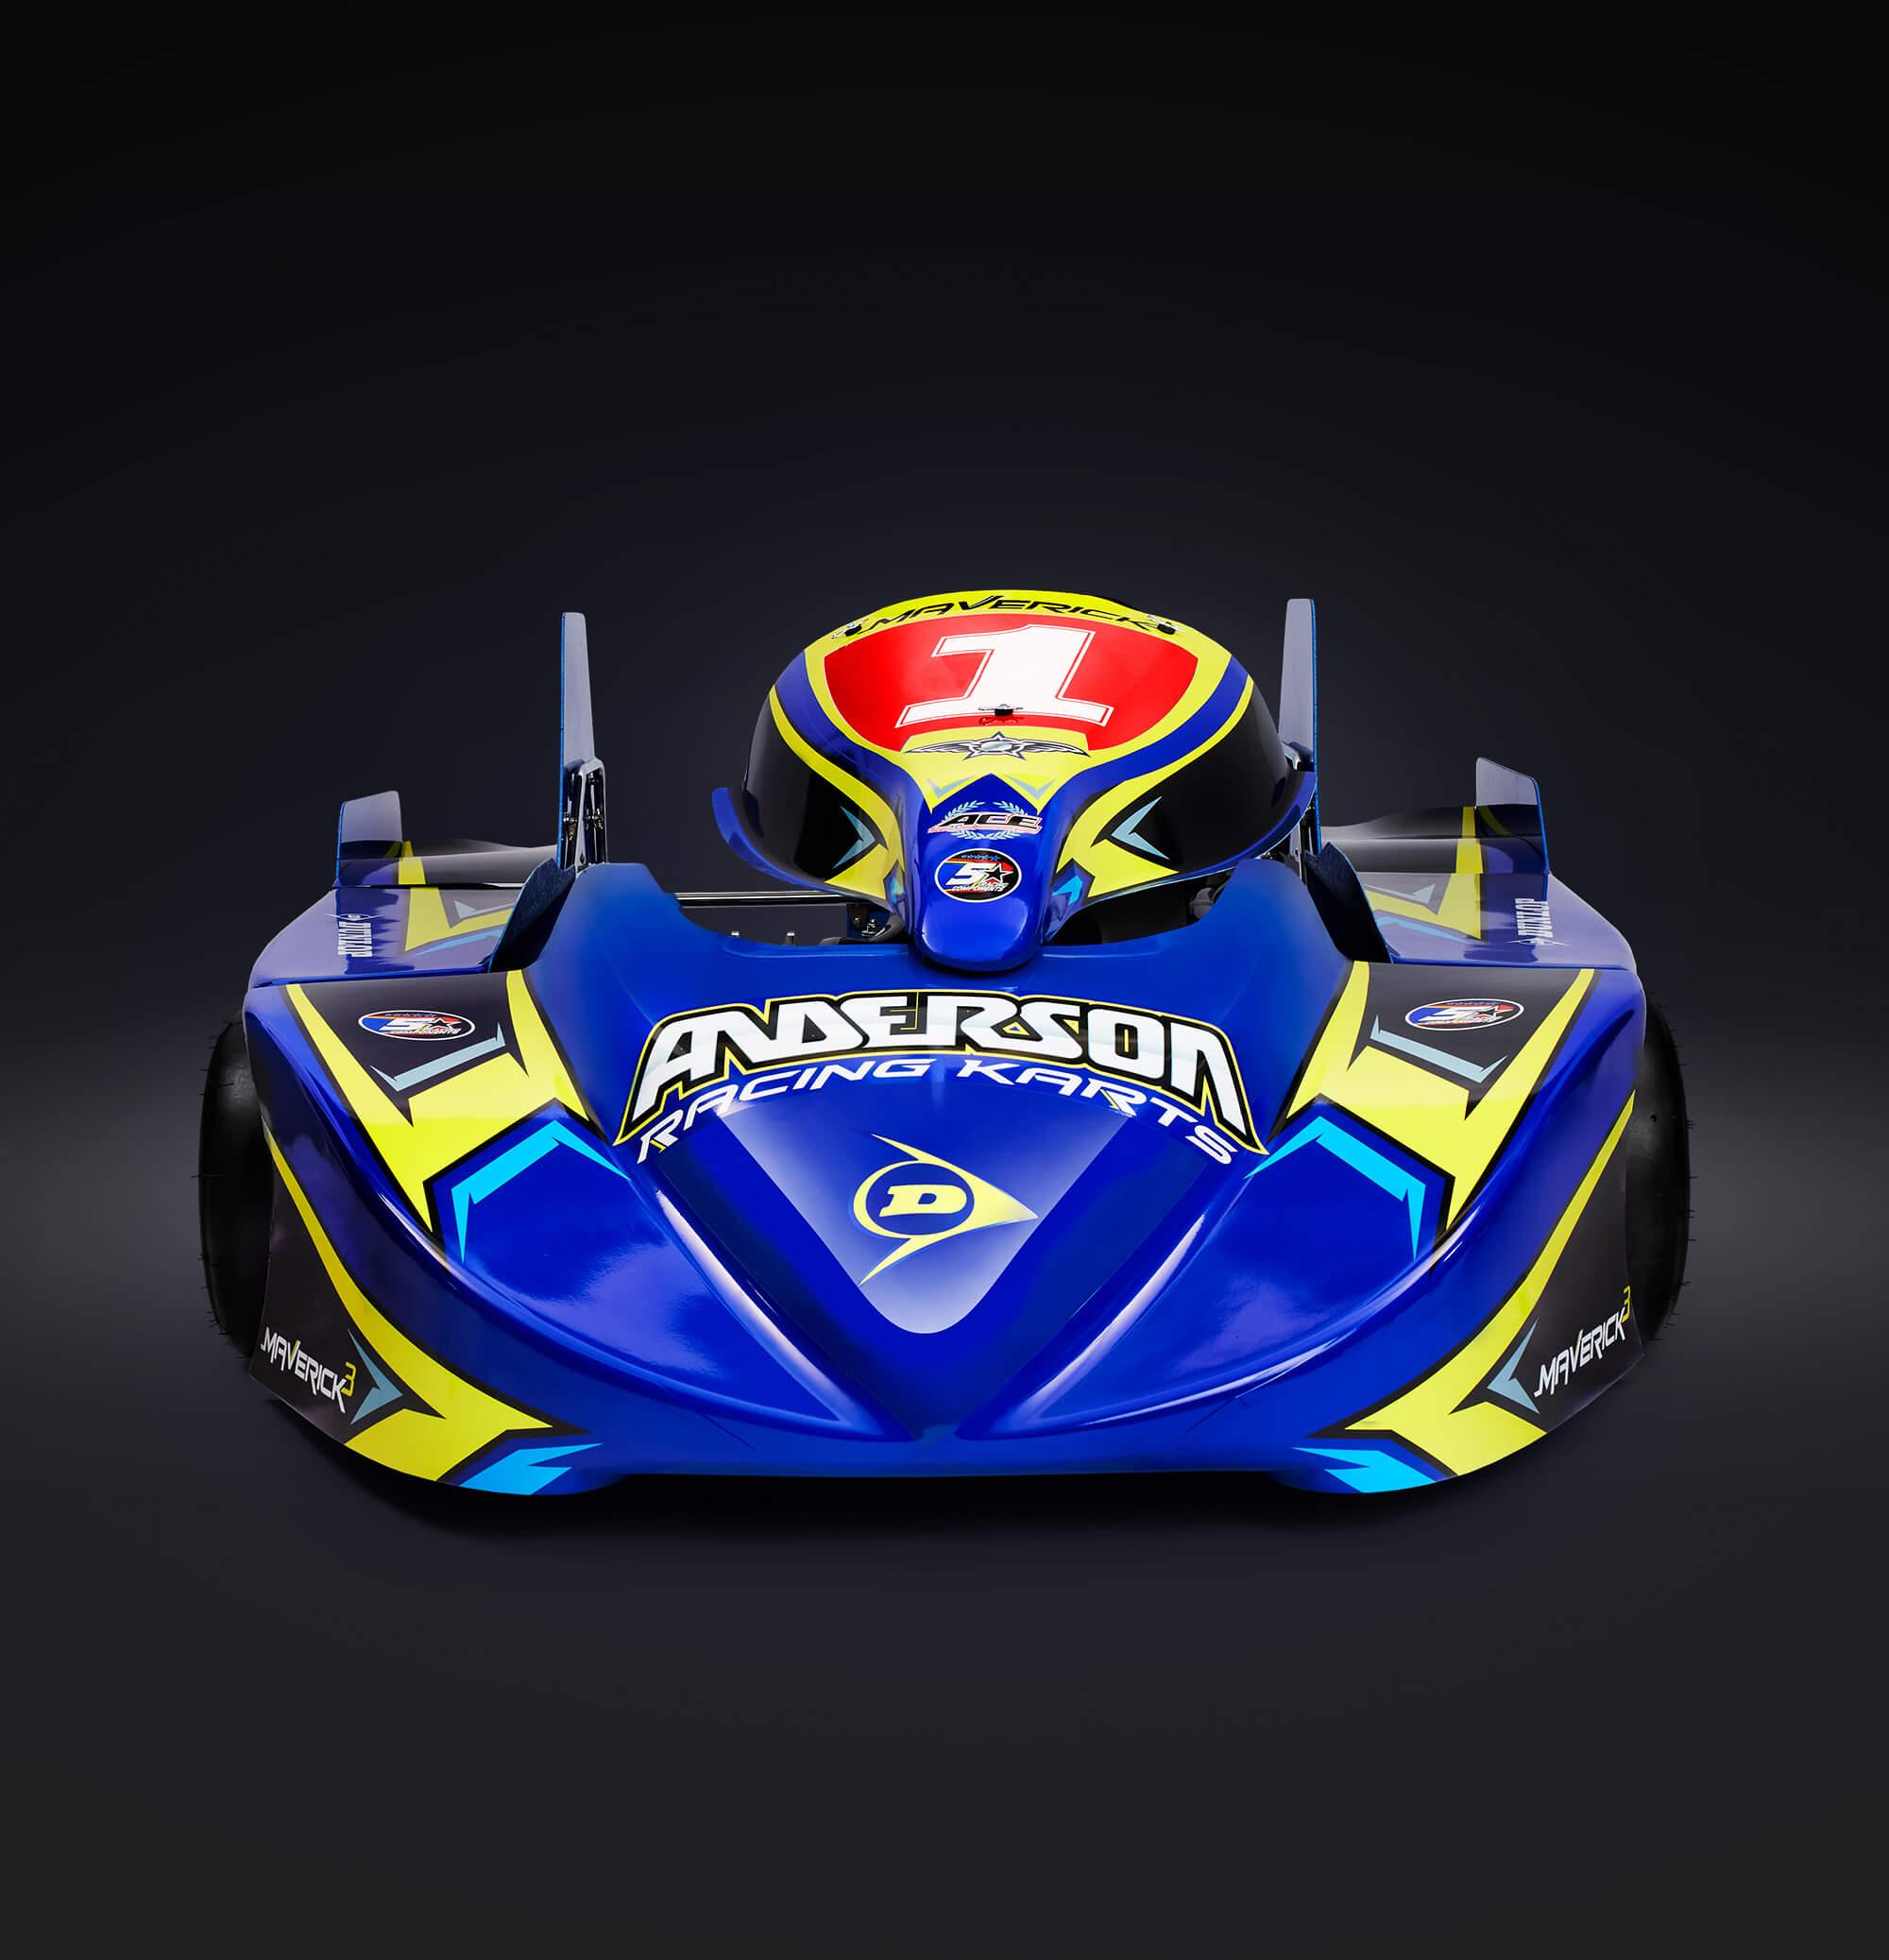 Anderson Maverick 3 250 Div 1 Superkart Front Perspective